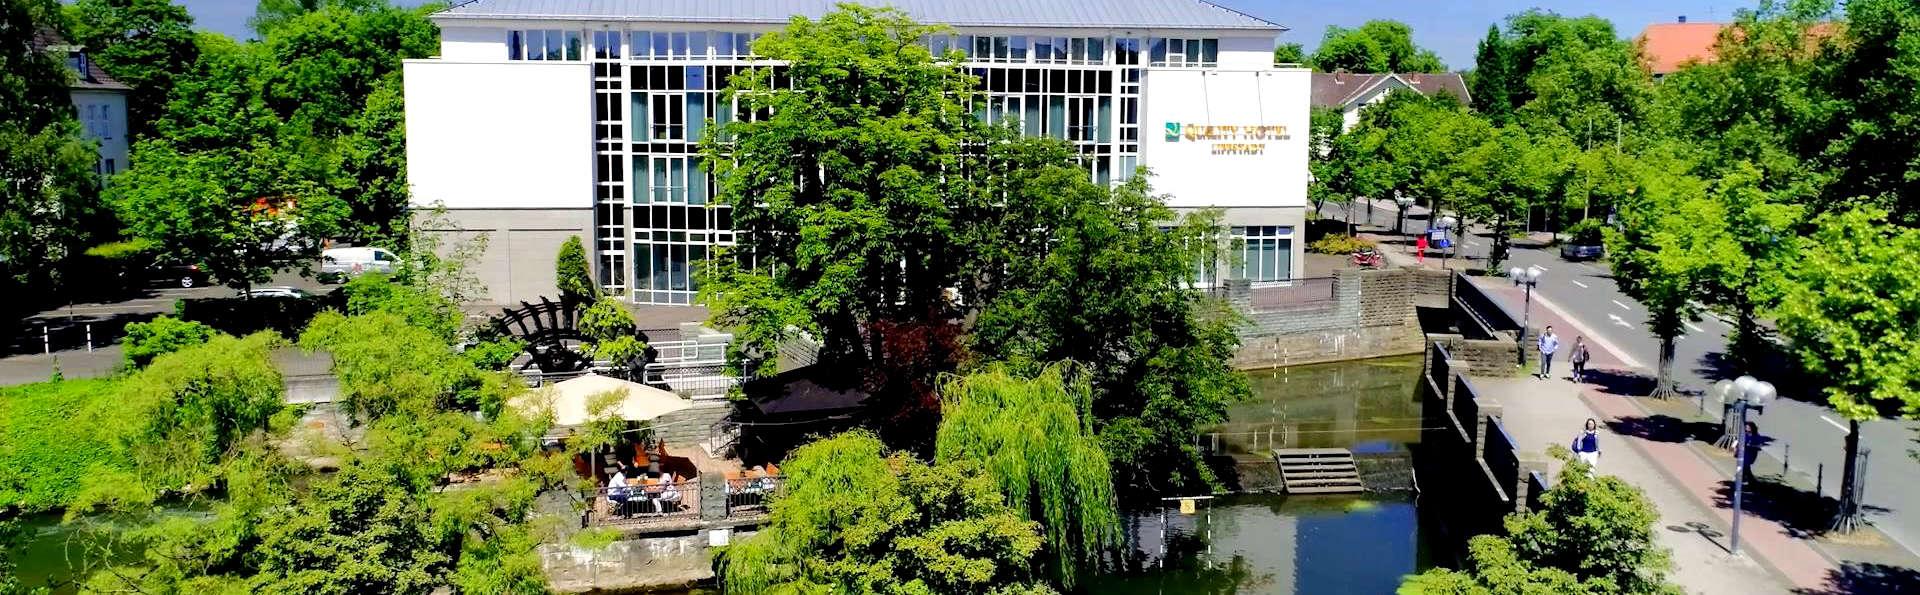 Quality Hotel Lippstadt - Edit_front.jpg